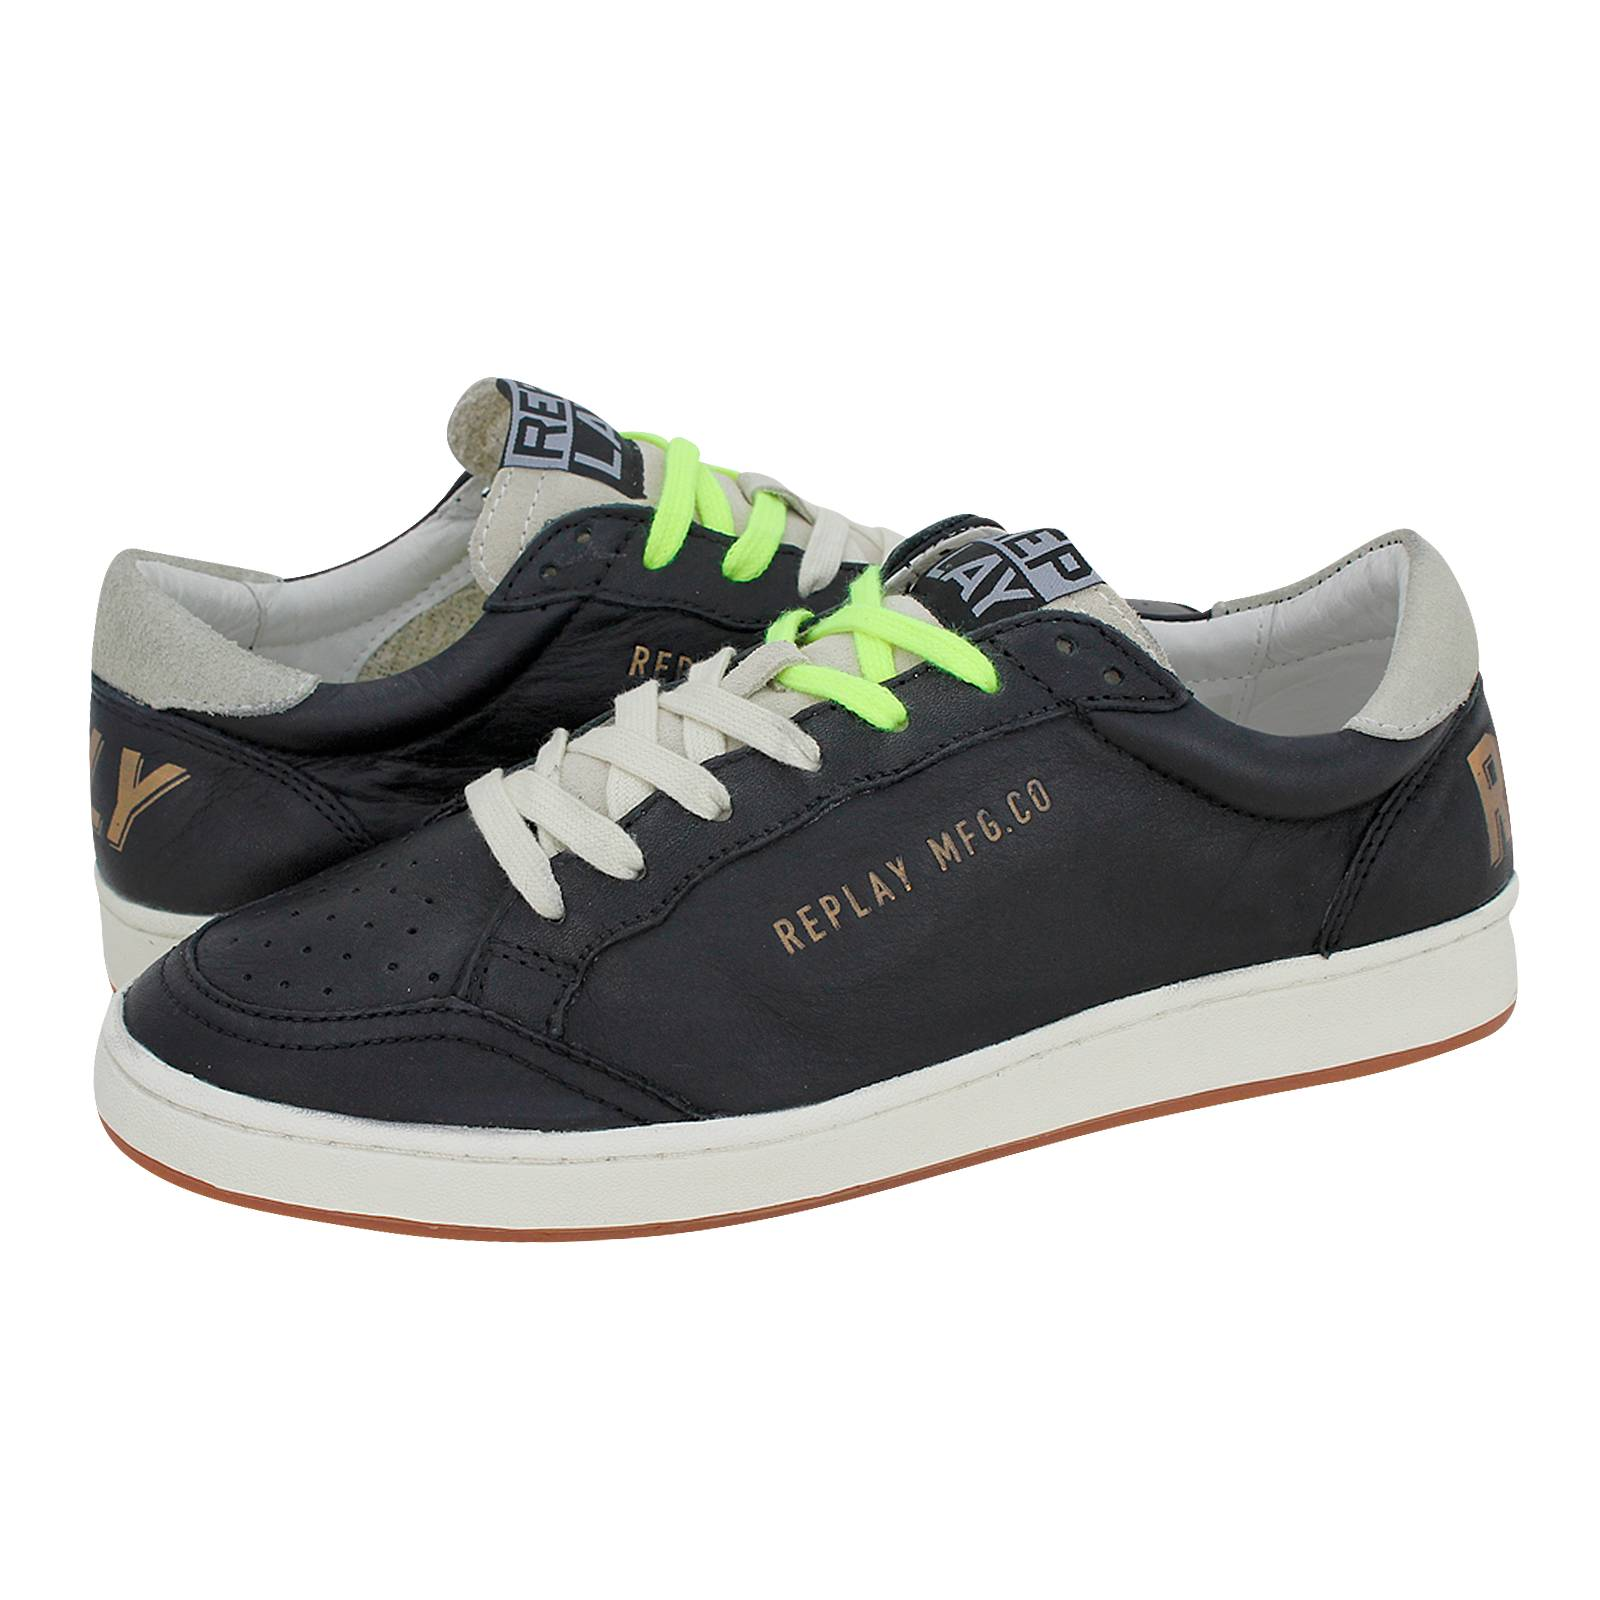 4e2c155e5ee Chenu - Ανδρικά παπούτσια casual Replay από δέρμα - Gianna Kazakou ...